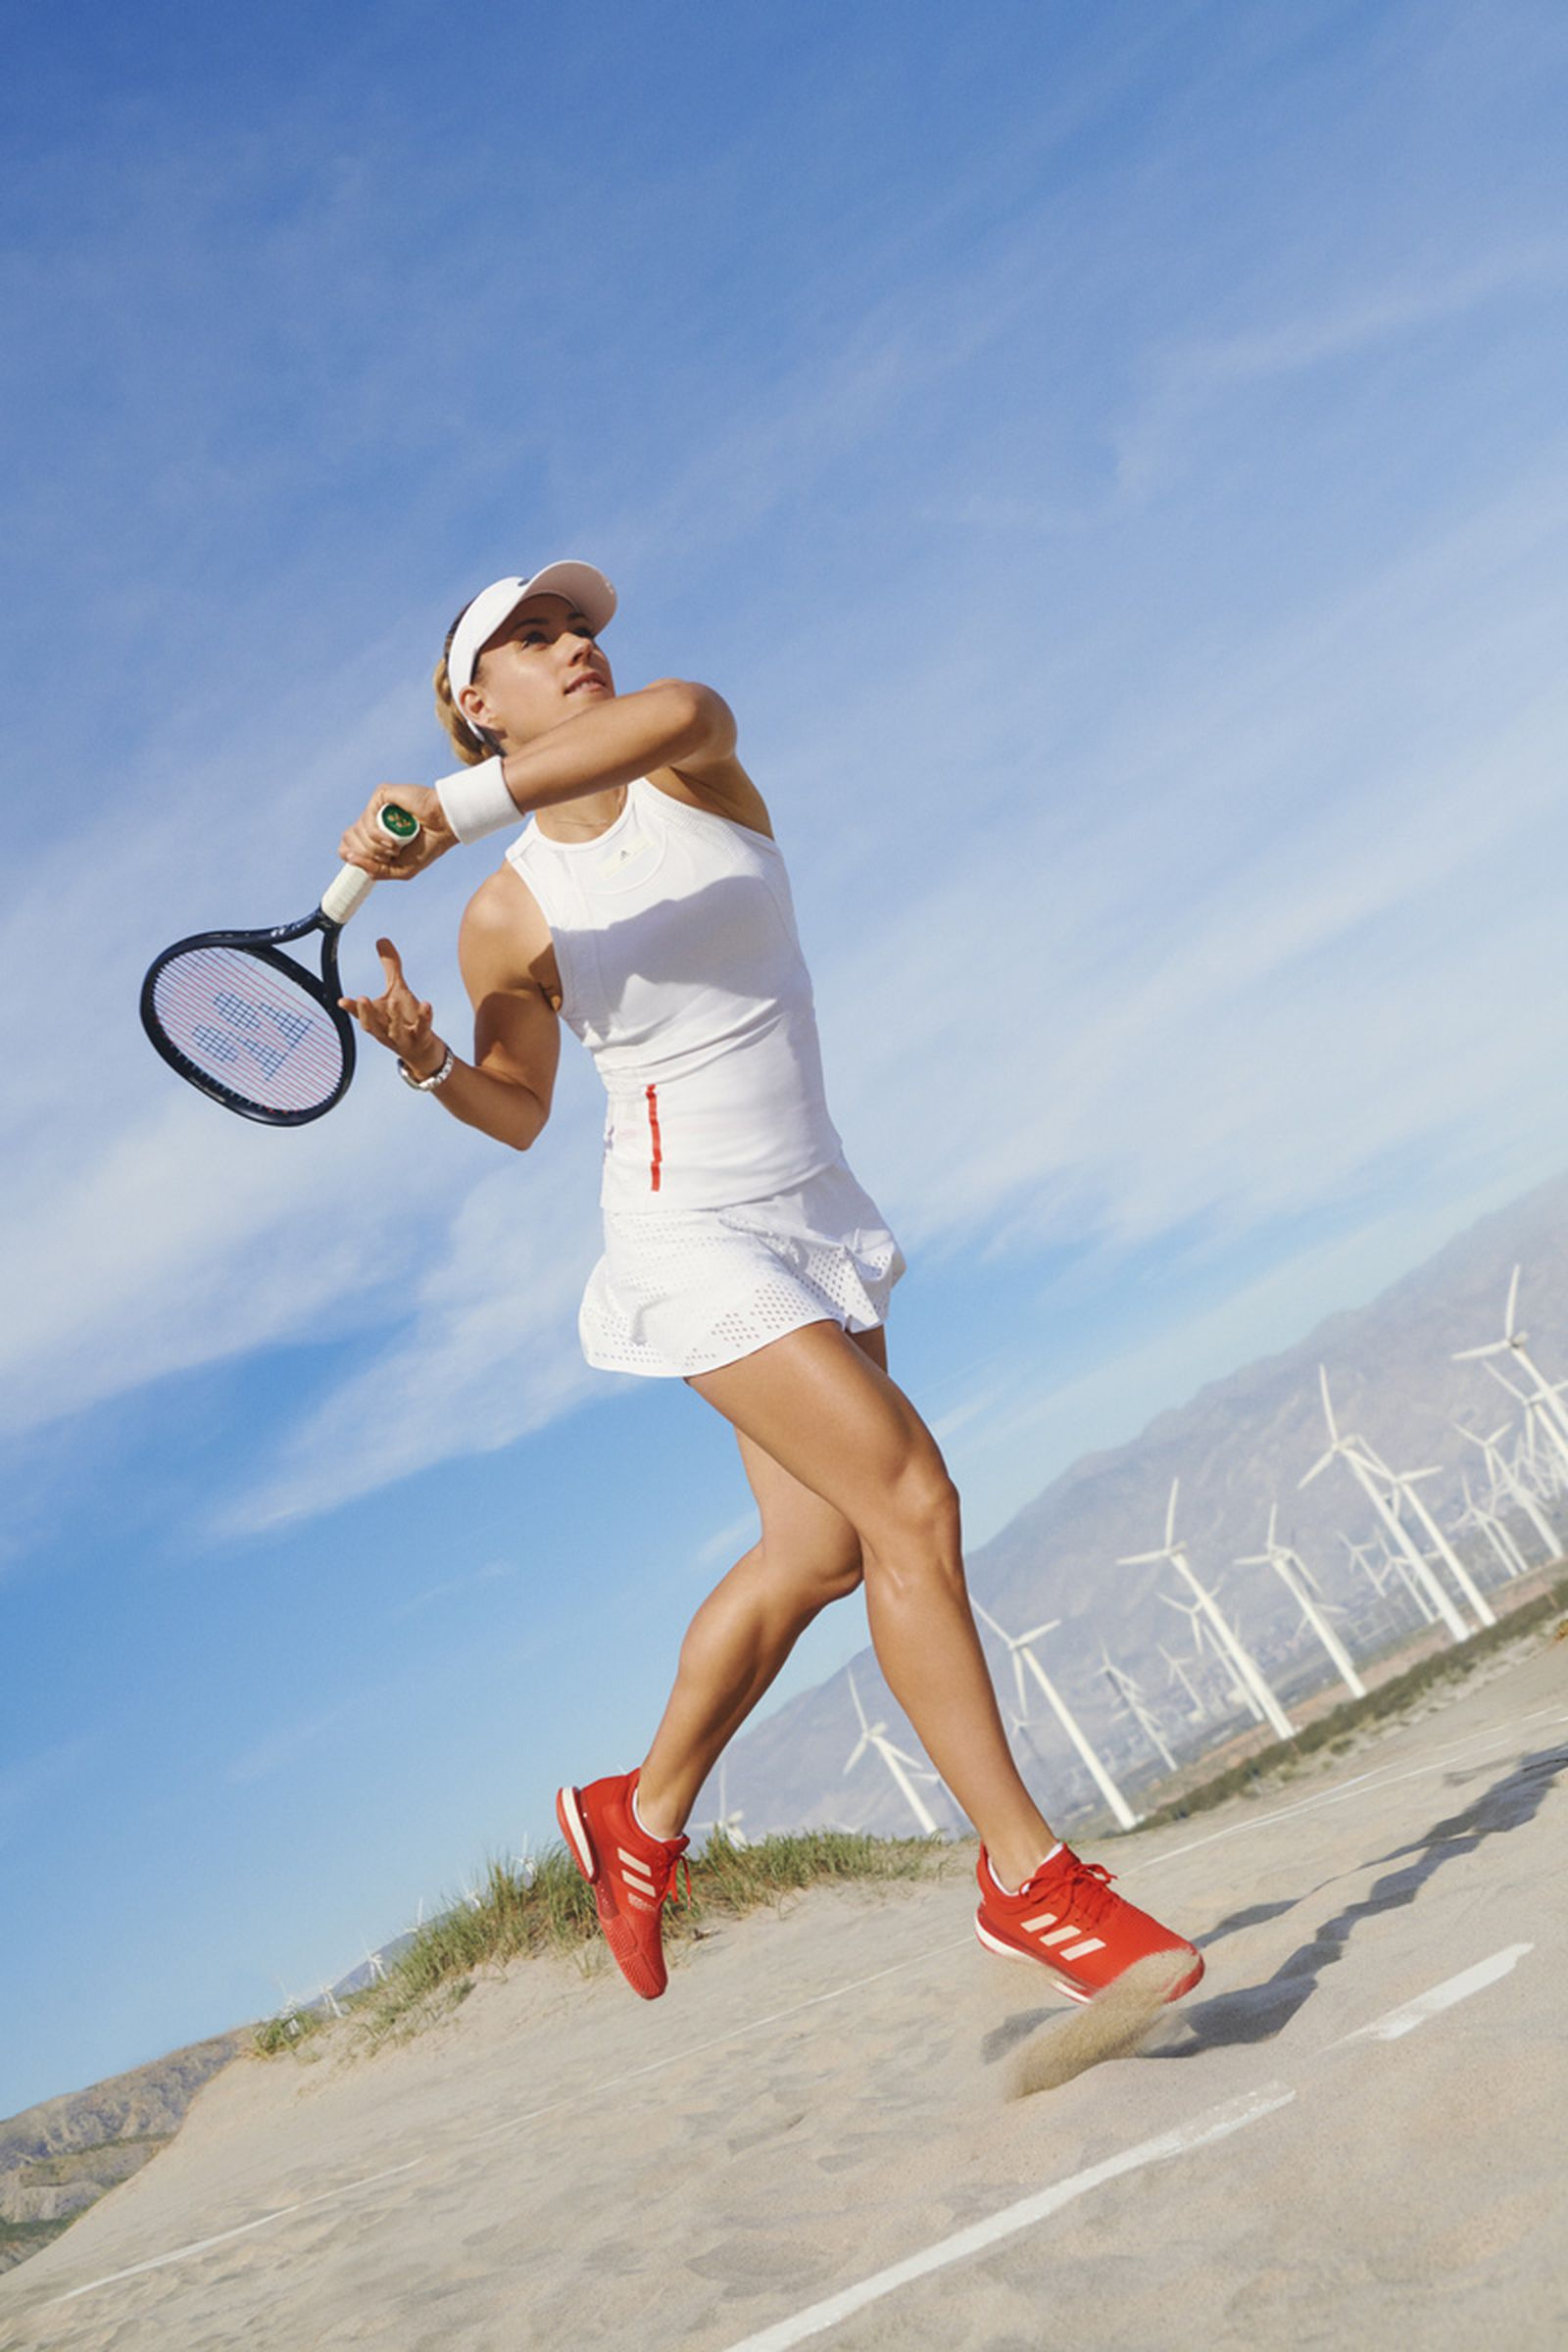 stella mccartney Wimbledon adidas Parley adidas by Stella McCartney